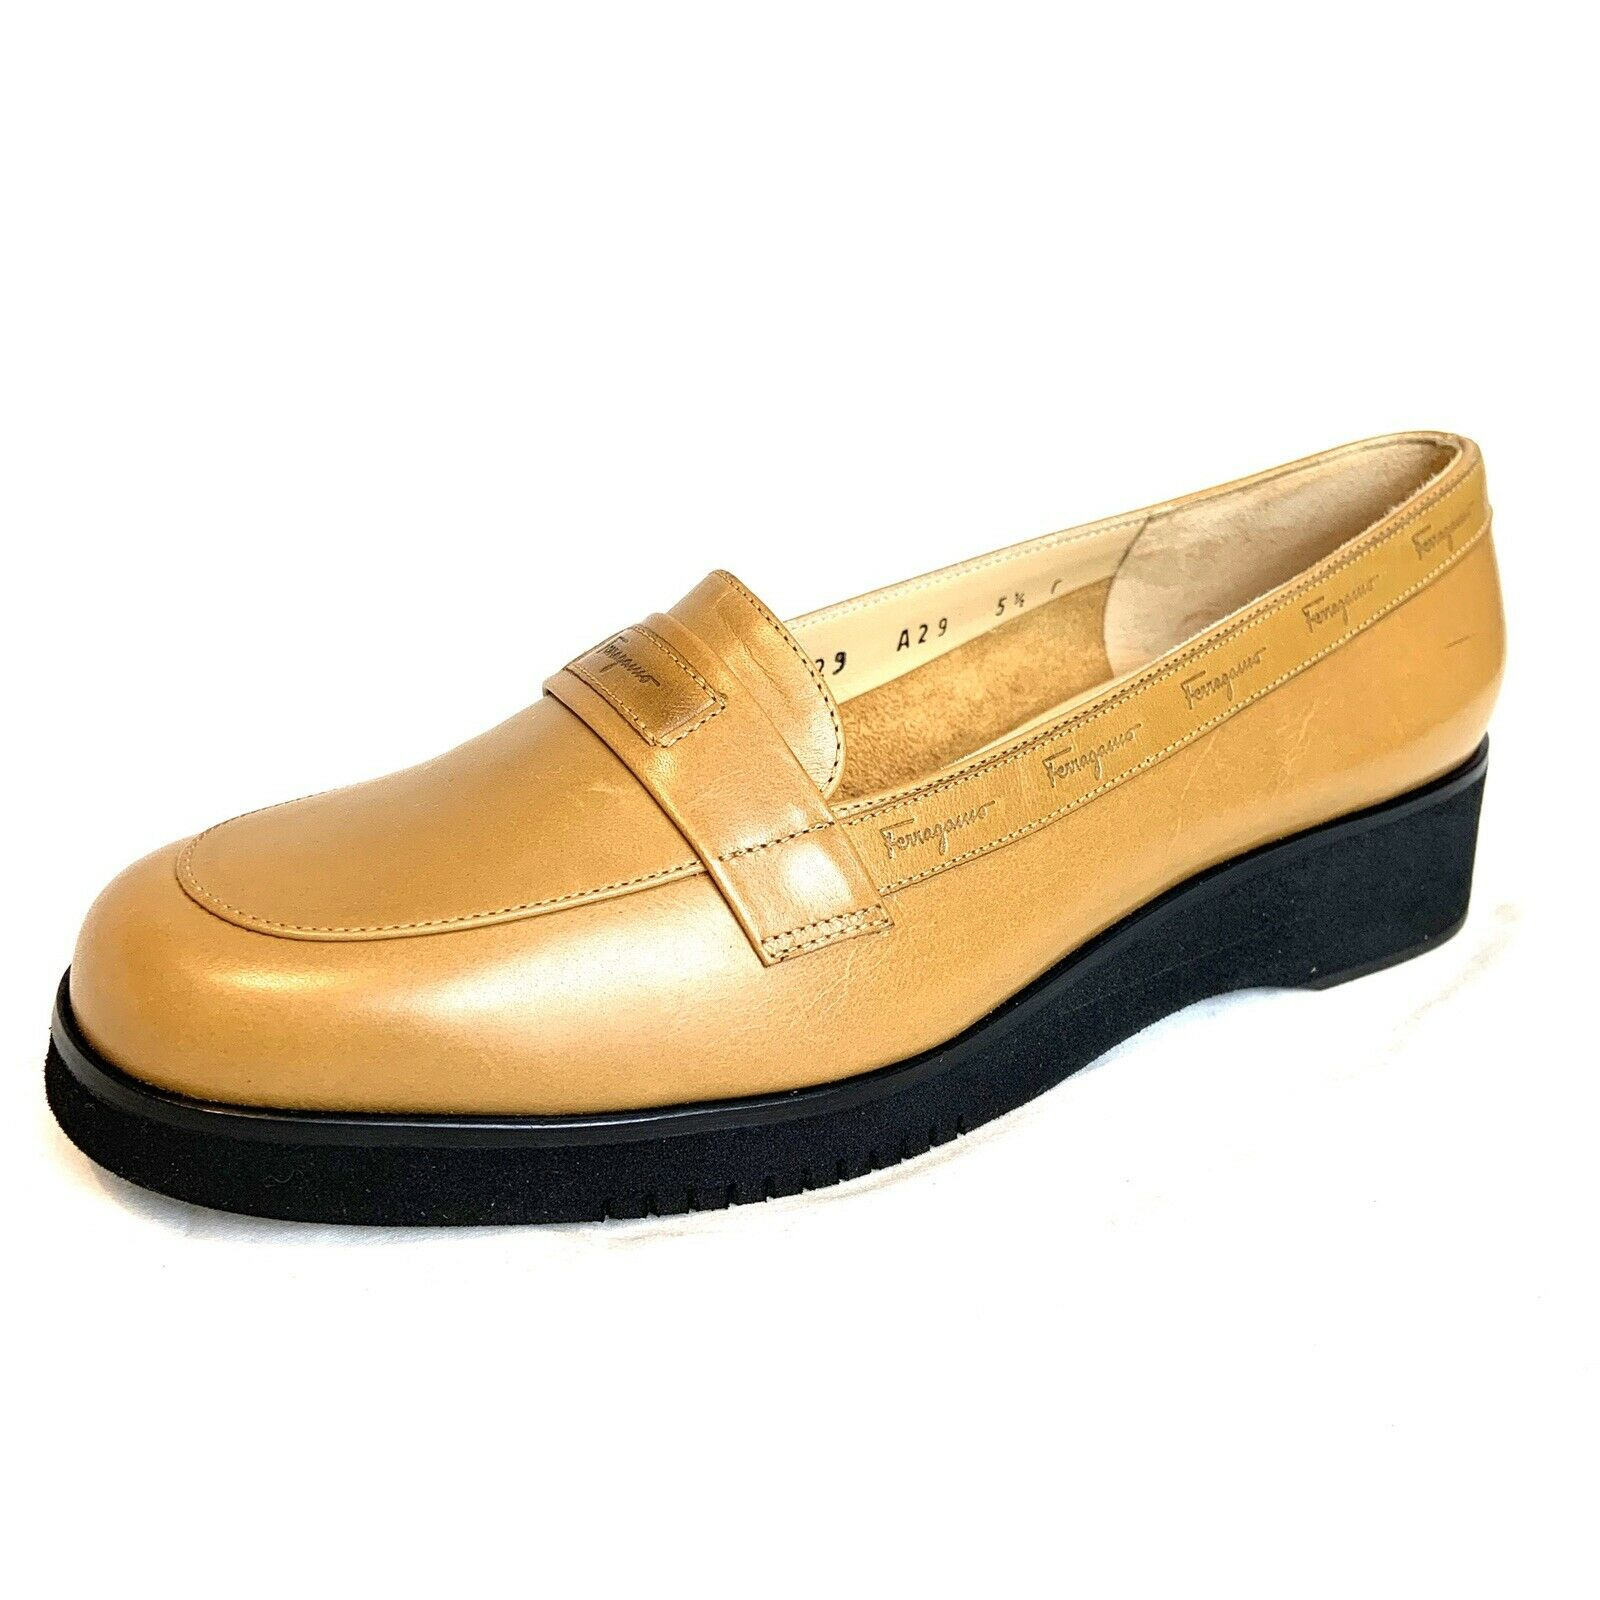 Salvatore Ferragamo Camel Moccasin Loafers Wedge  US 5.5 - EU 36 - UK 3.5